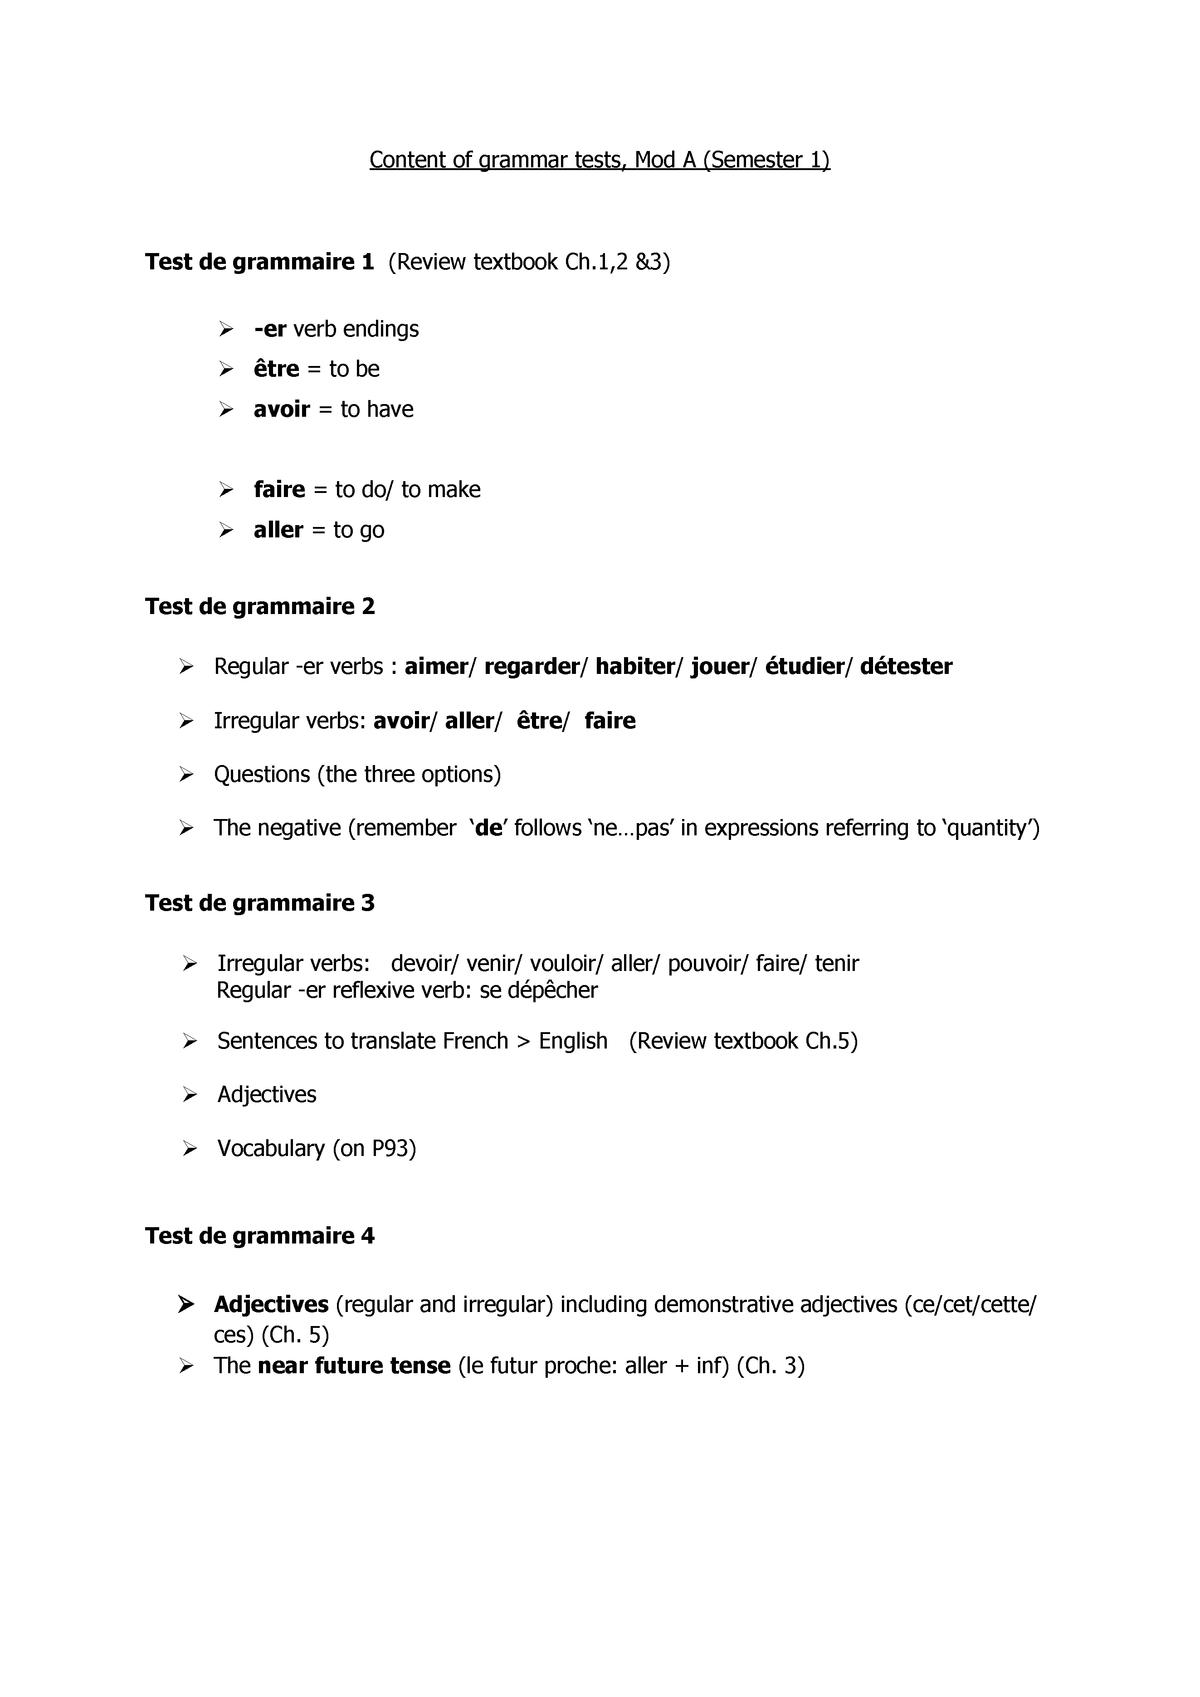 PF11001 Mod A Content of grammar tests - PF11001: Applied